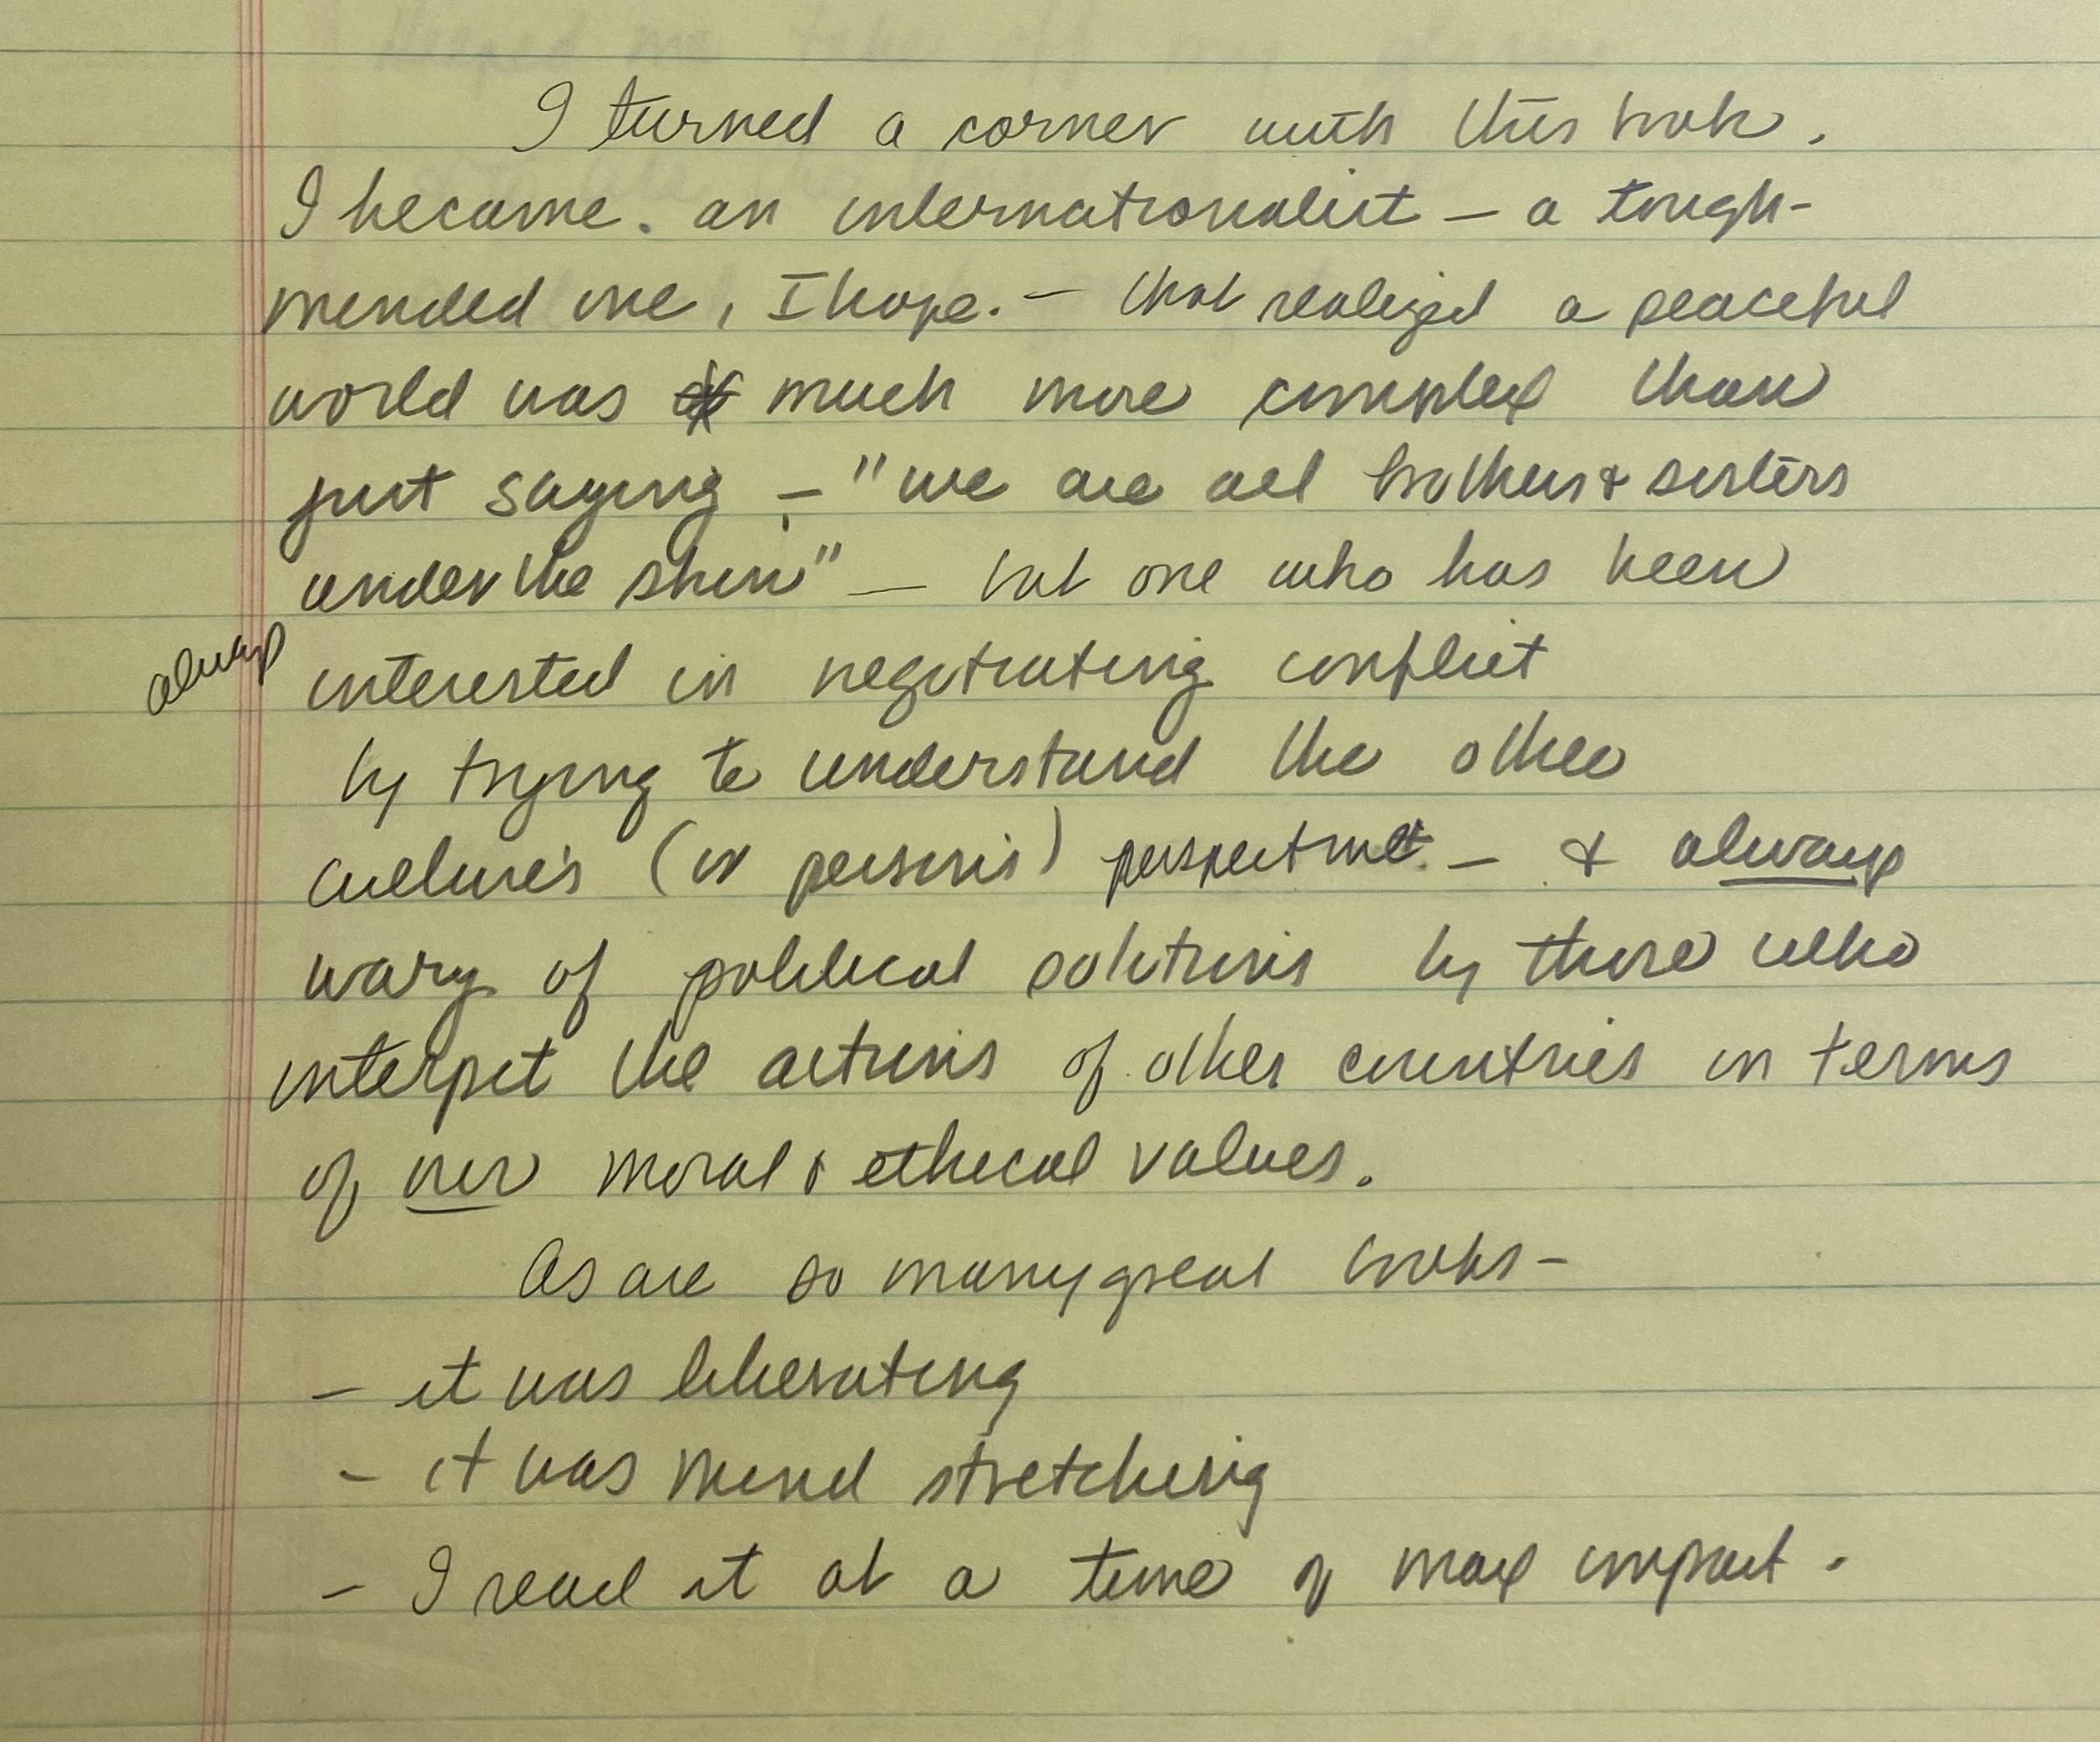 Handwritten note from Lolly